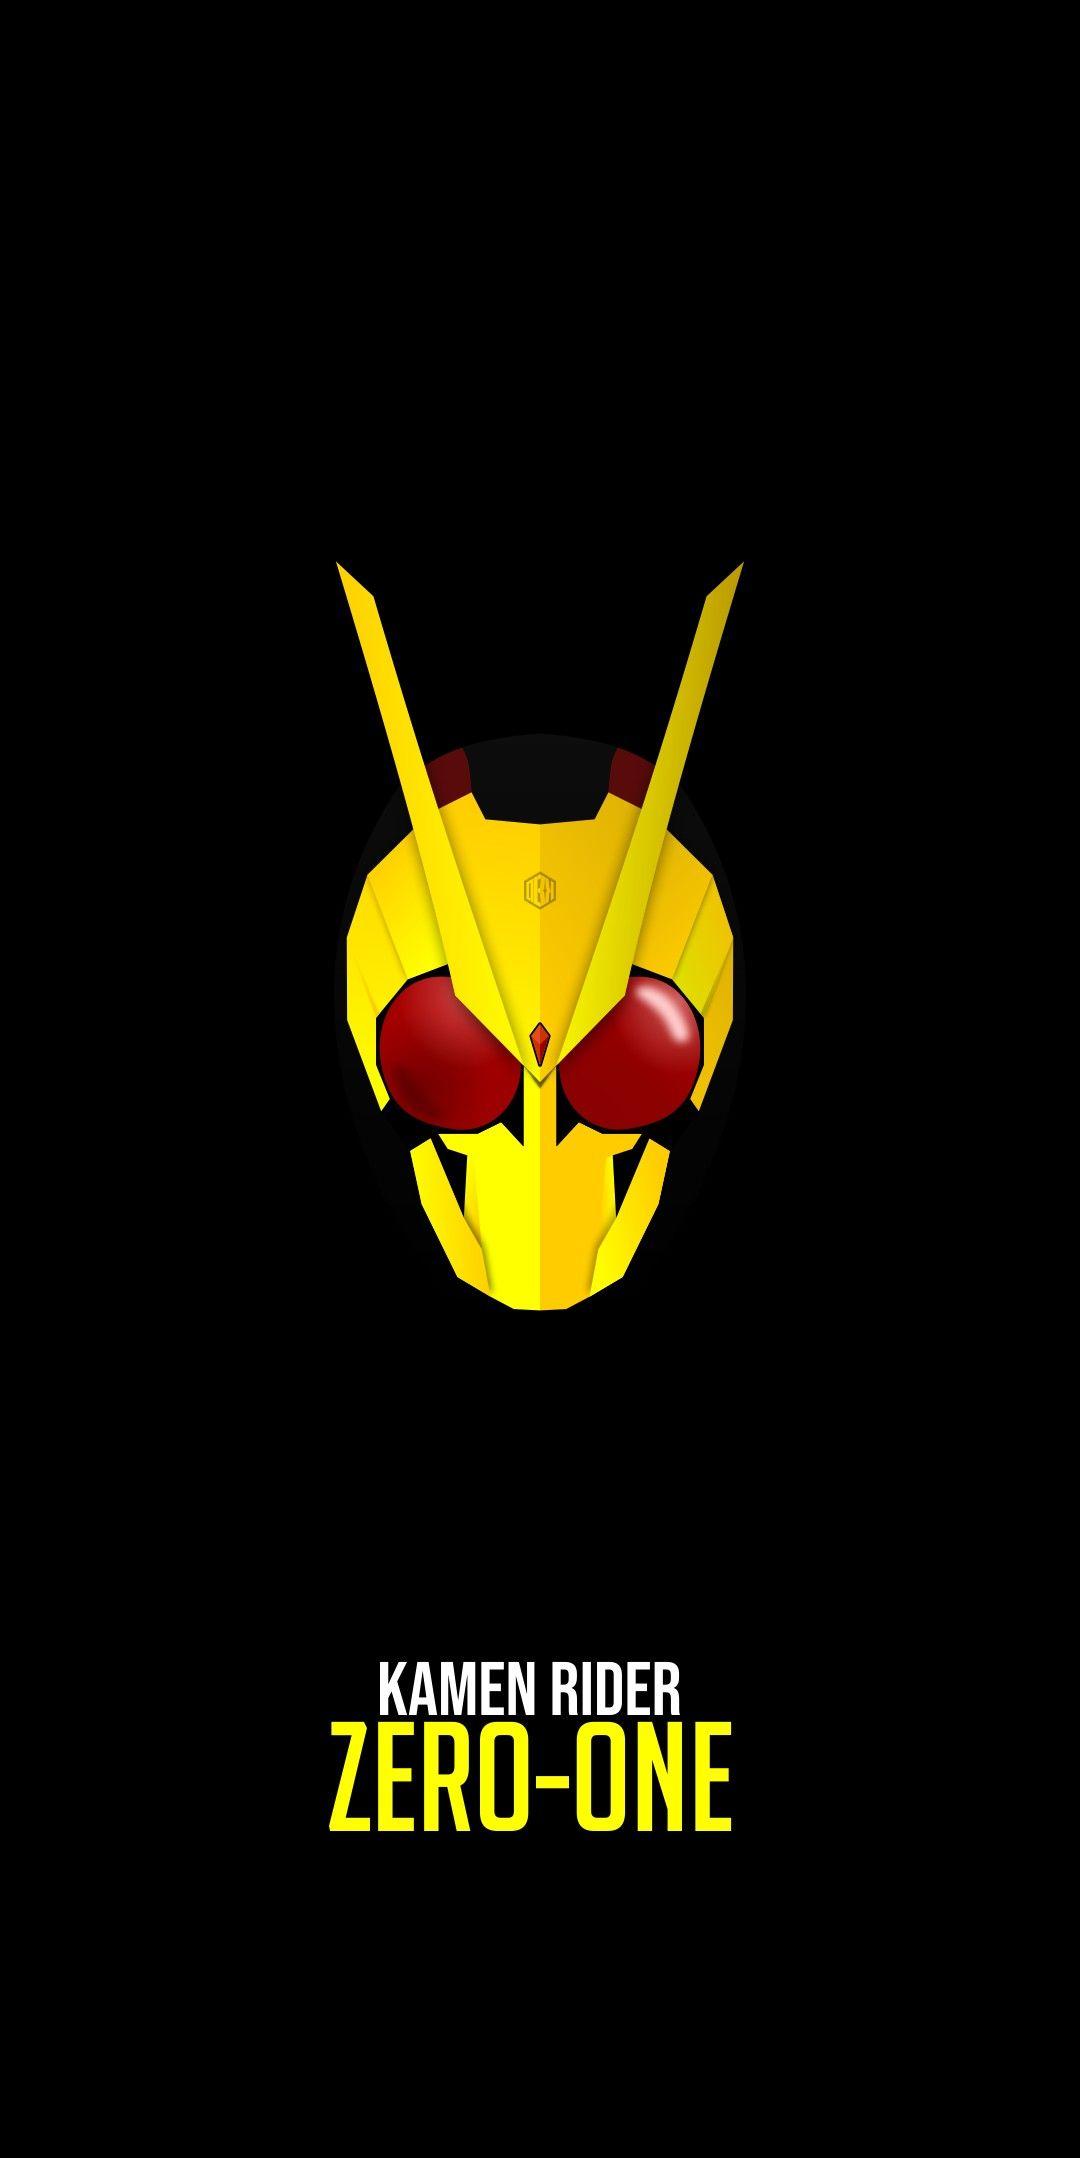 kamen rider zero one rising hopper vector style animasi fisika wallpaper ponsel pinterest ie